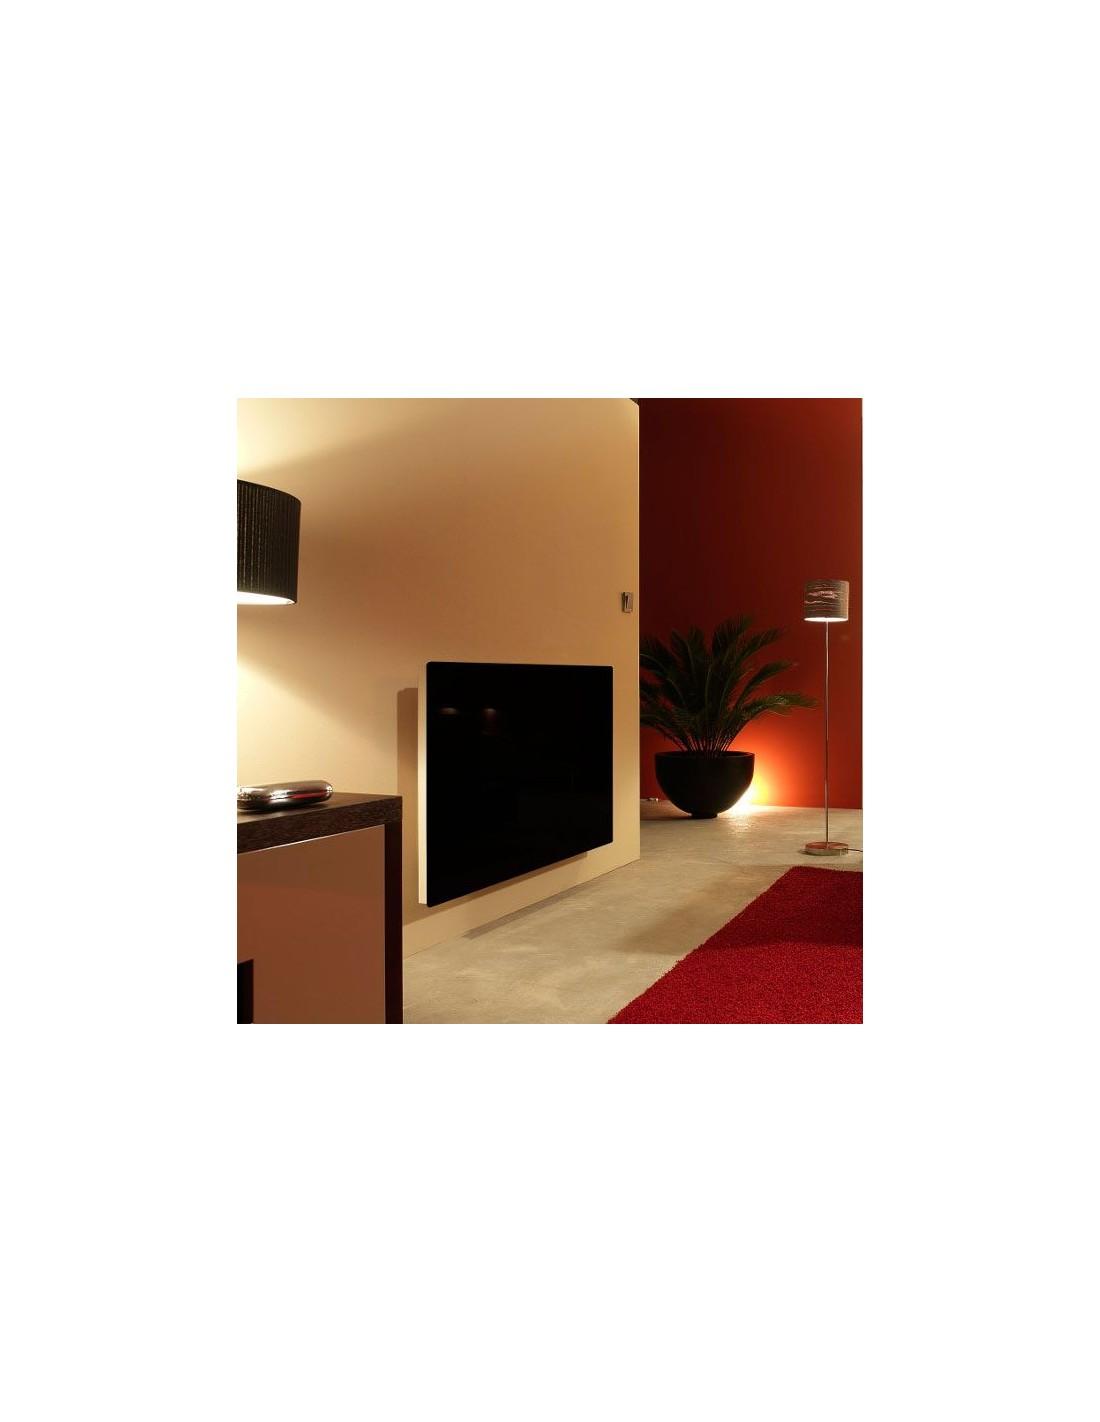 Radiateur Solaris horizontal 63 1000W noir brillant de la marque Fondis - Valente Design